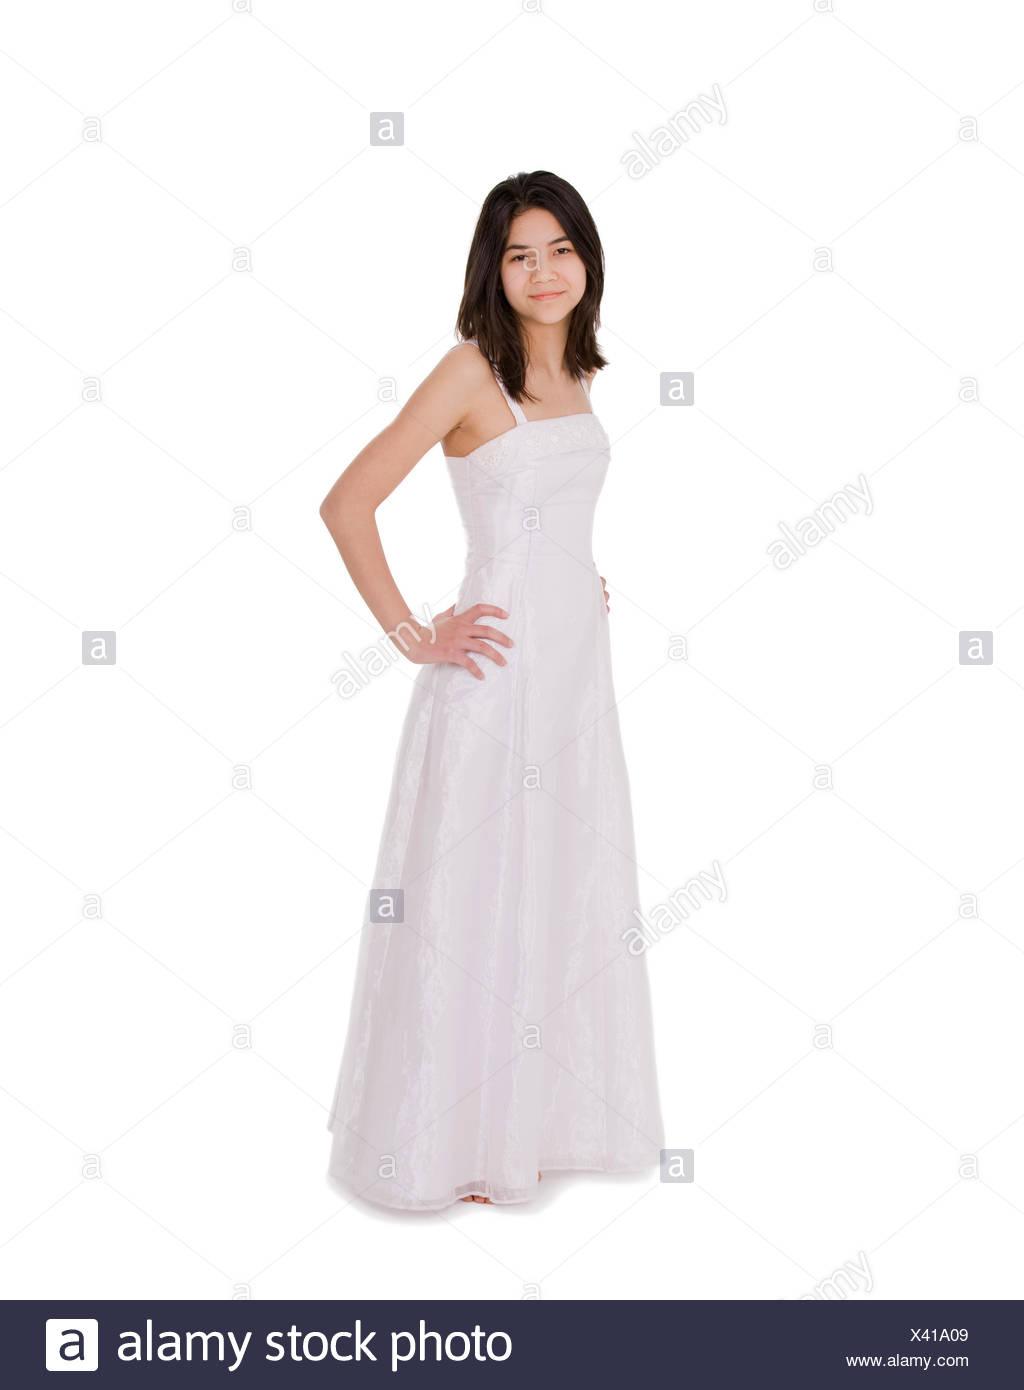 Question interesting, Teen model white dress join